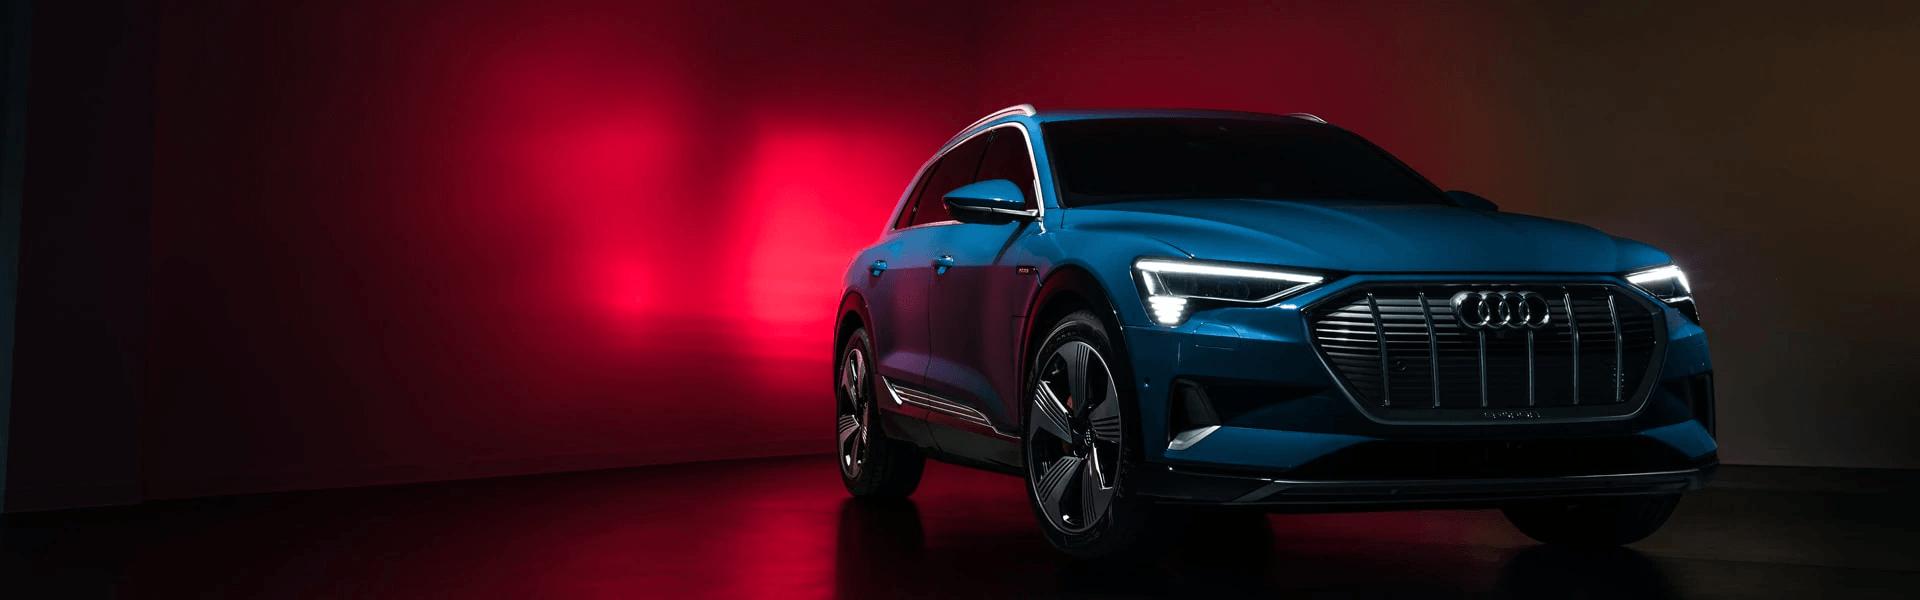 1 - Hero - 2019 Audi ETron